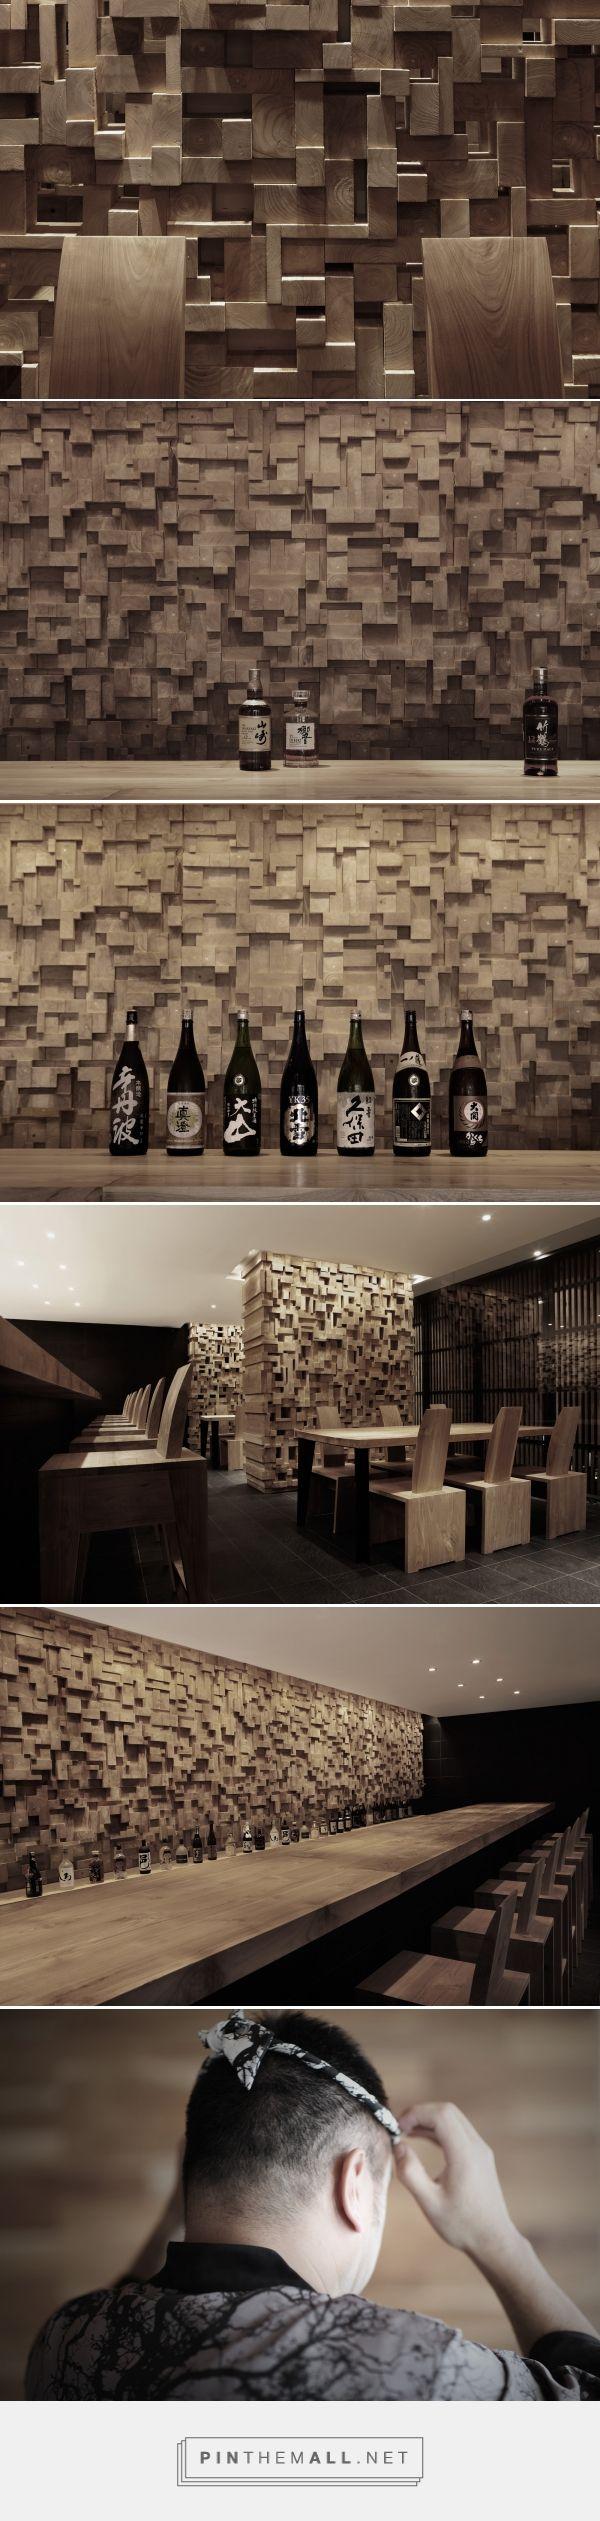 Shiro Sushi / Sake, Bali curated by Packaging Diva PD. Beautiful sake bar.